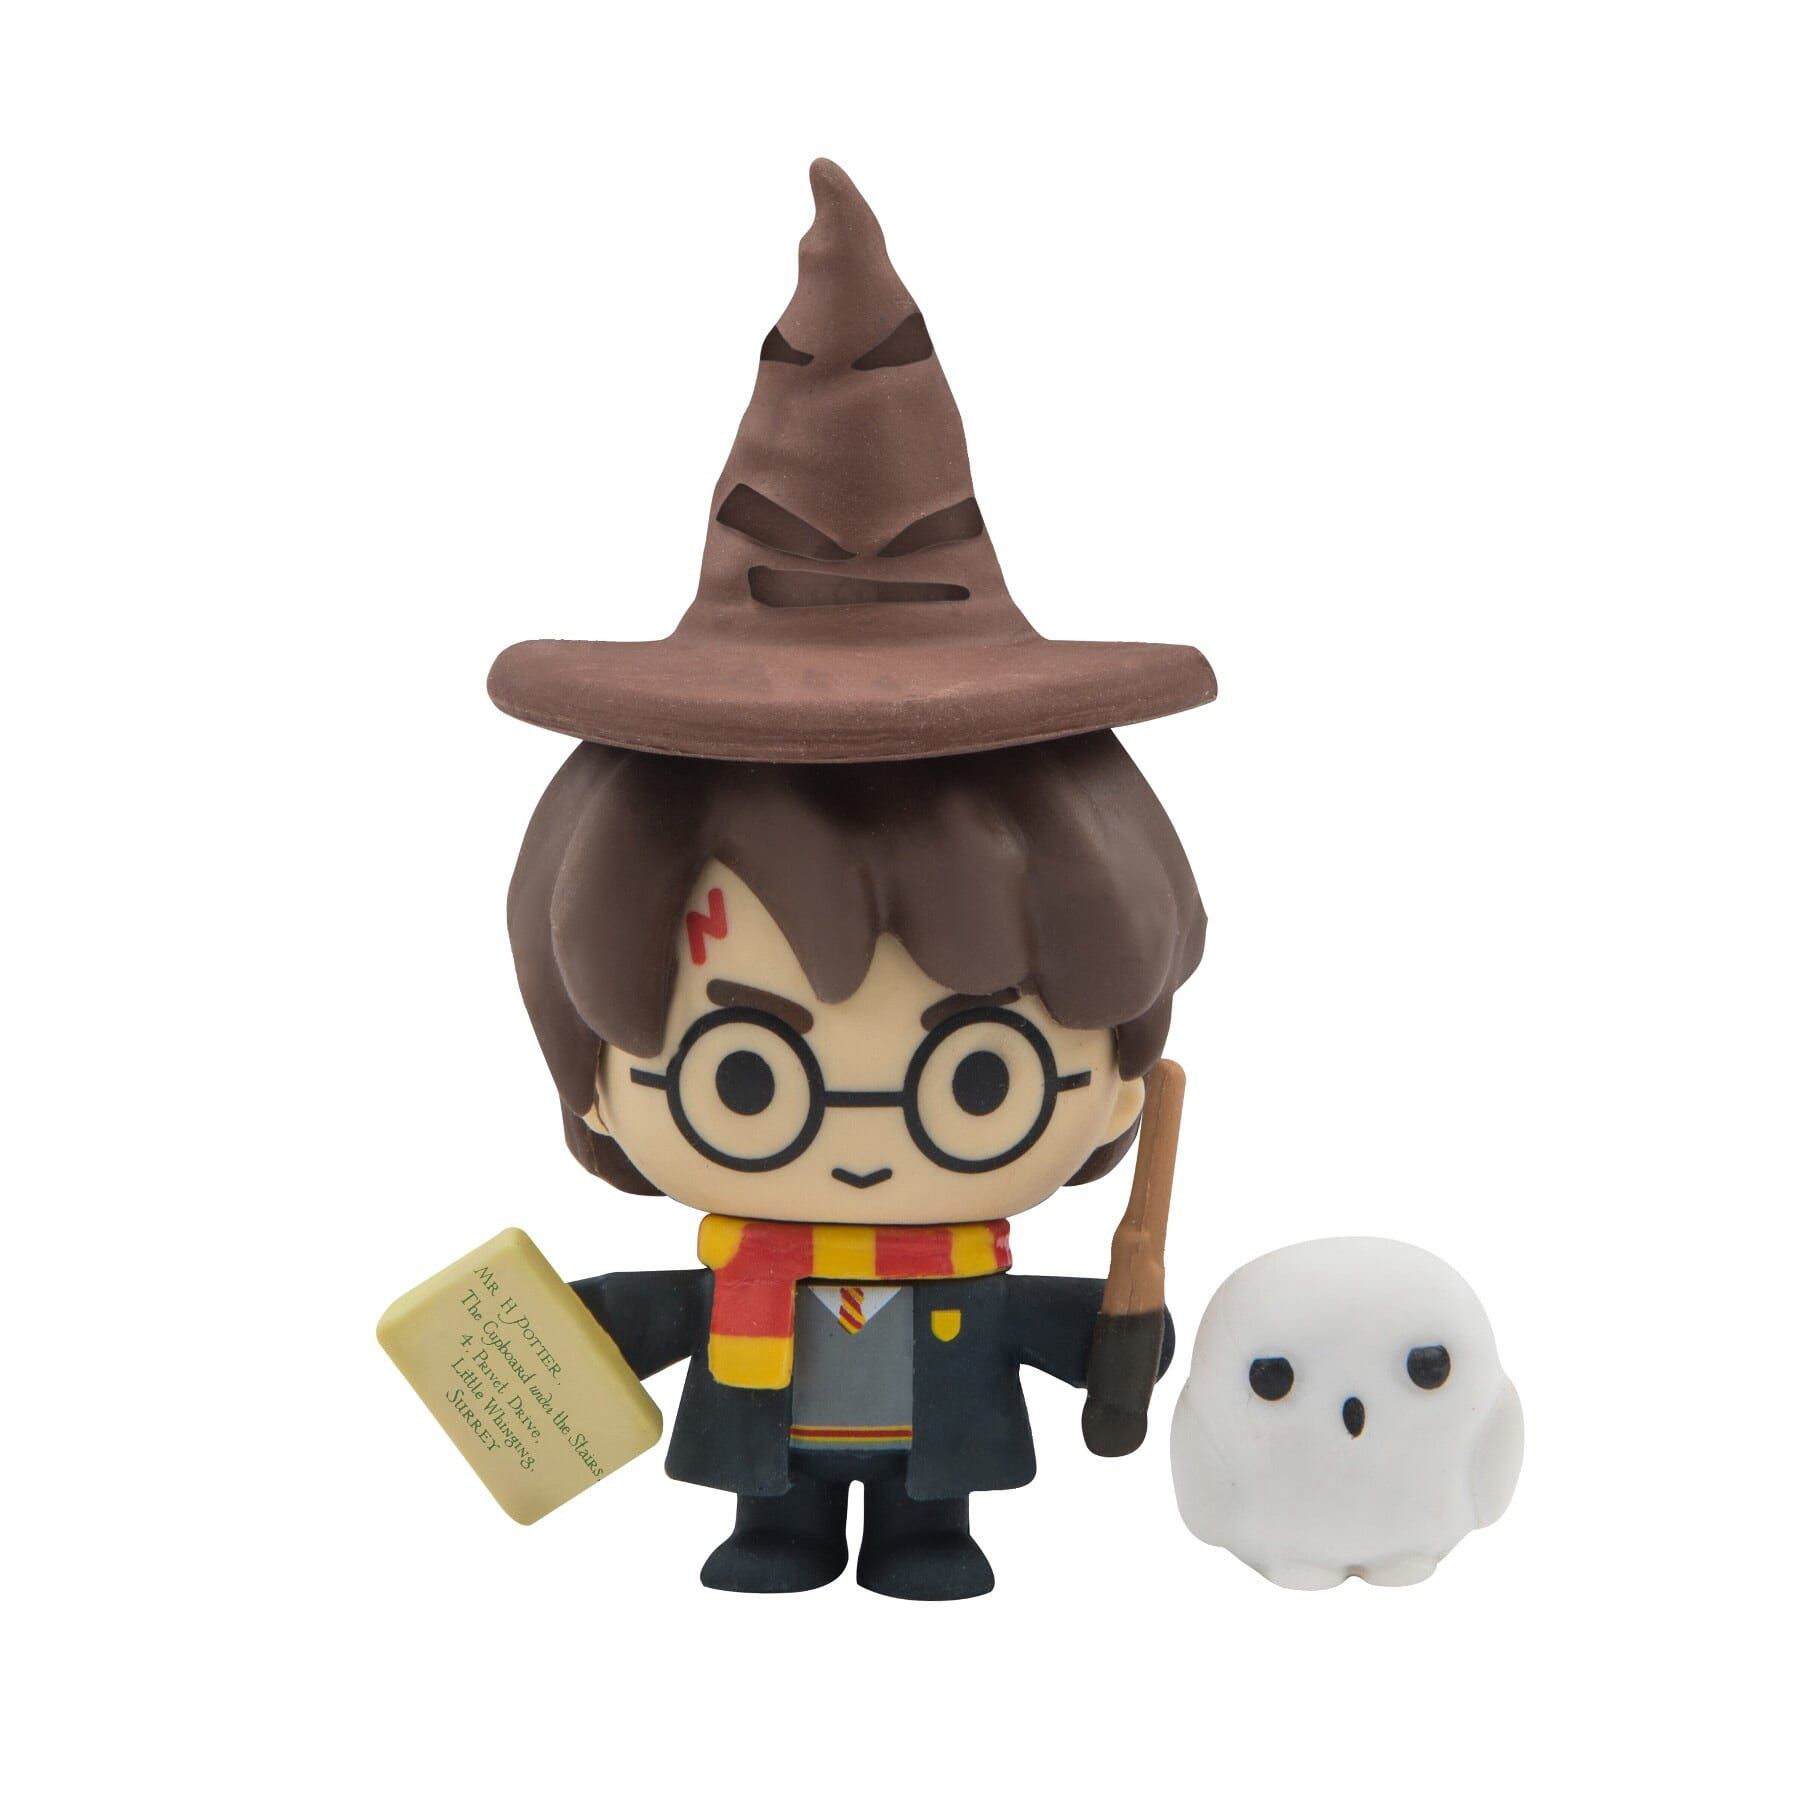 Harry Potter Mini Figures Γόμα CineReplicas (HPE60482)